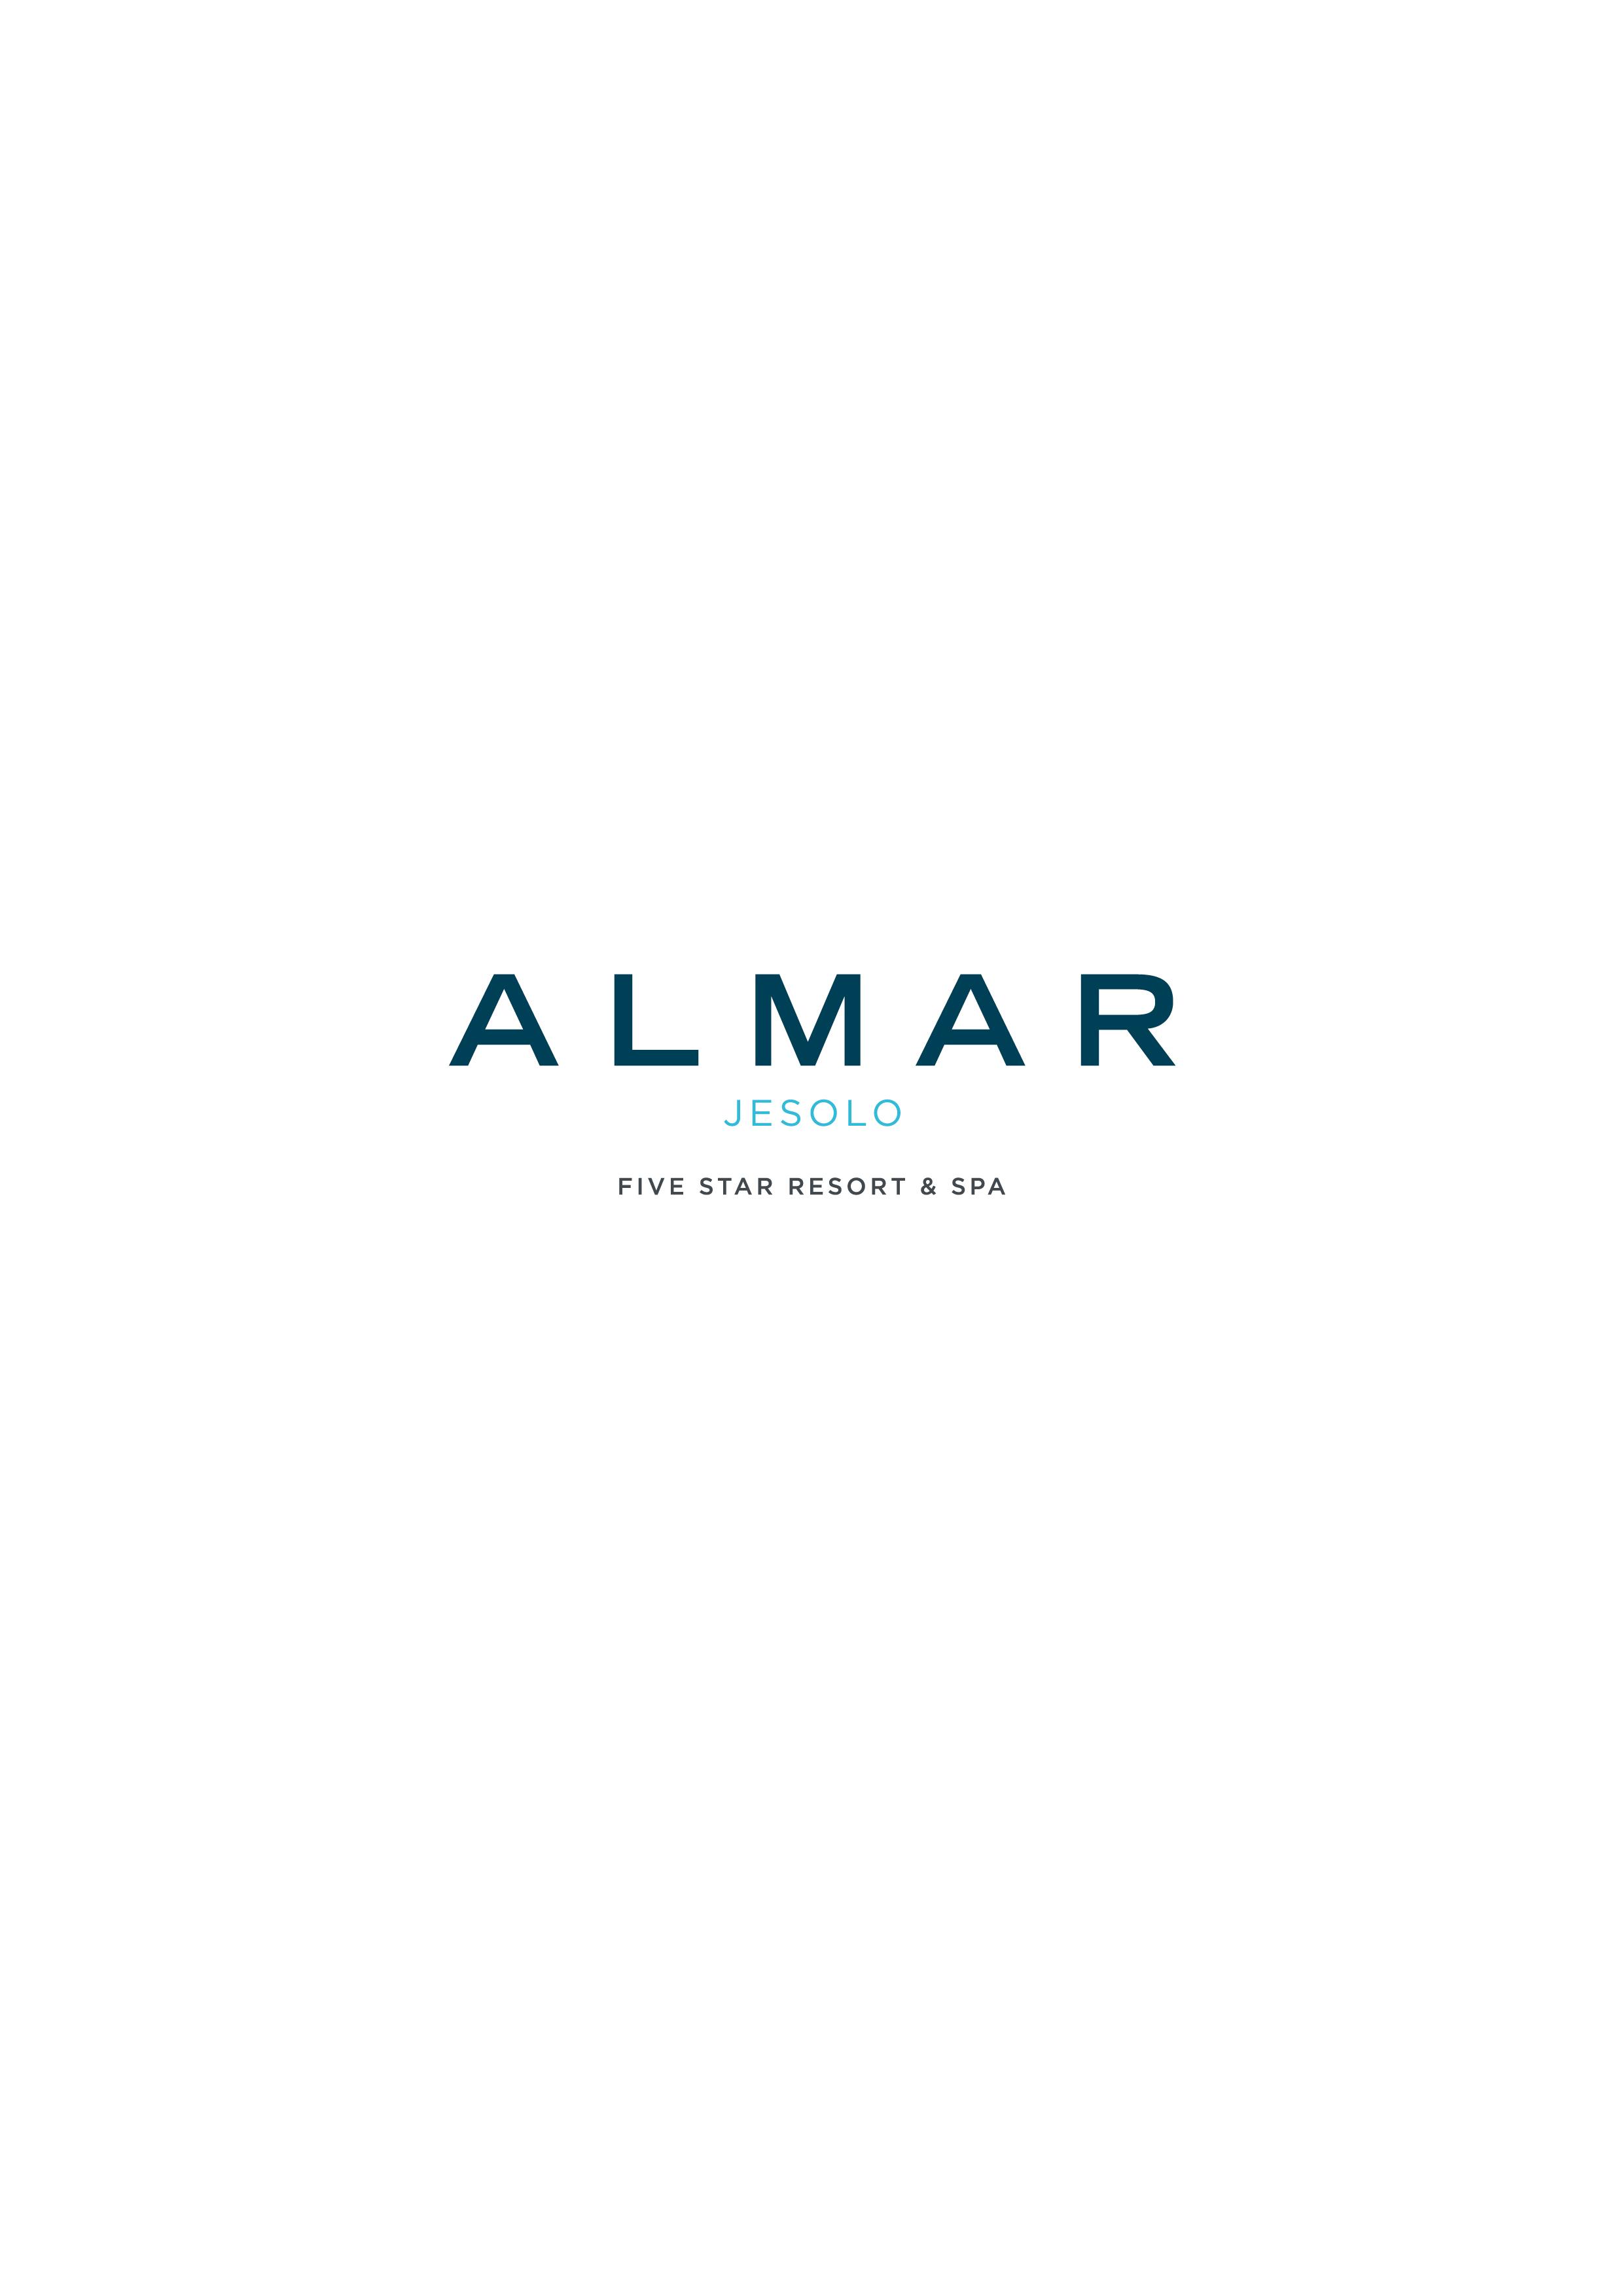 Logo_Almar_big_CMYK.jpg